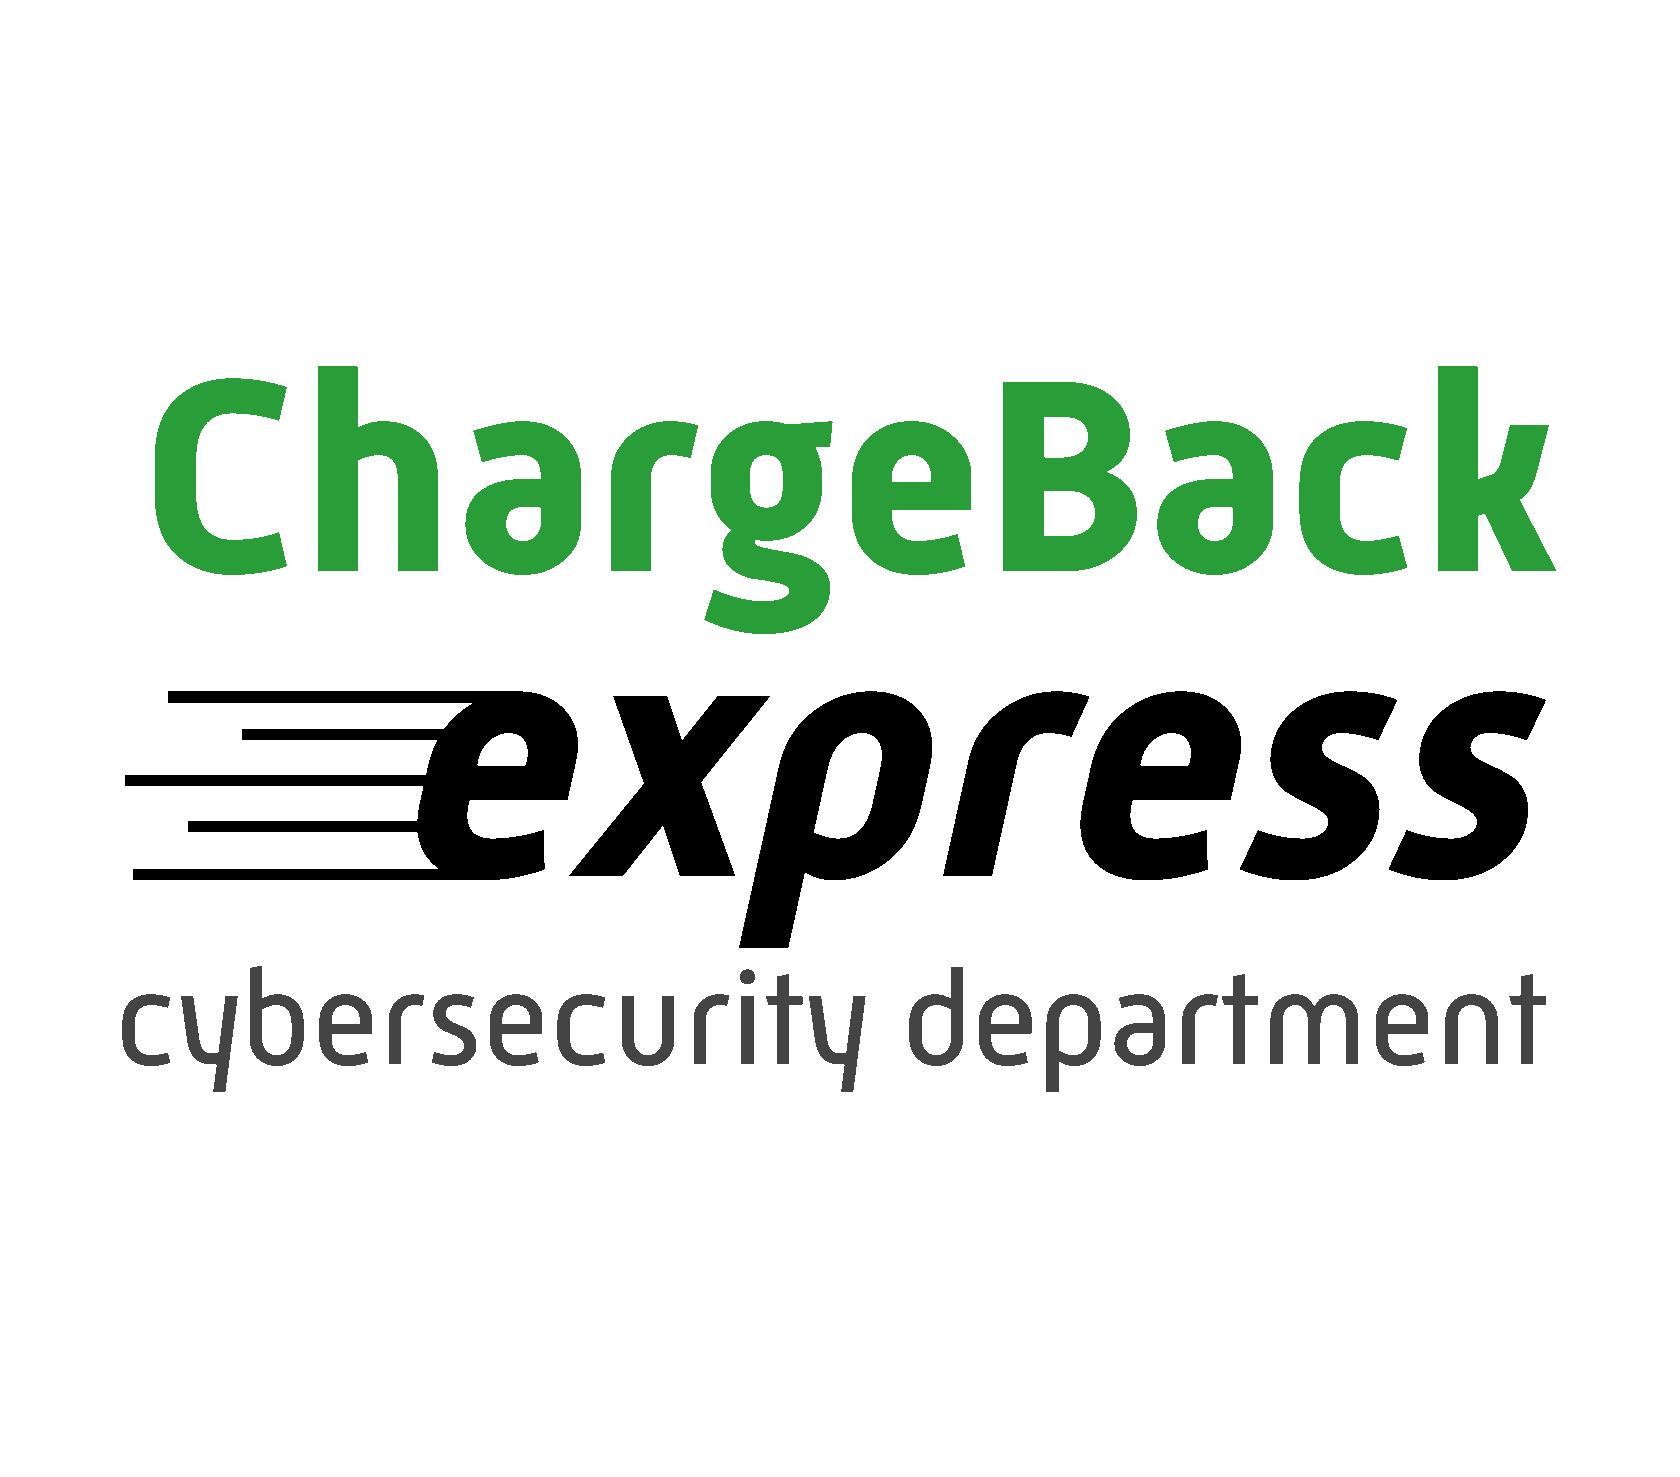 chargeback.express